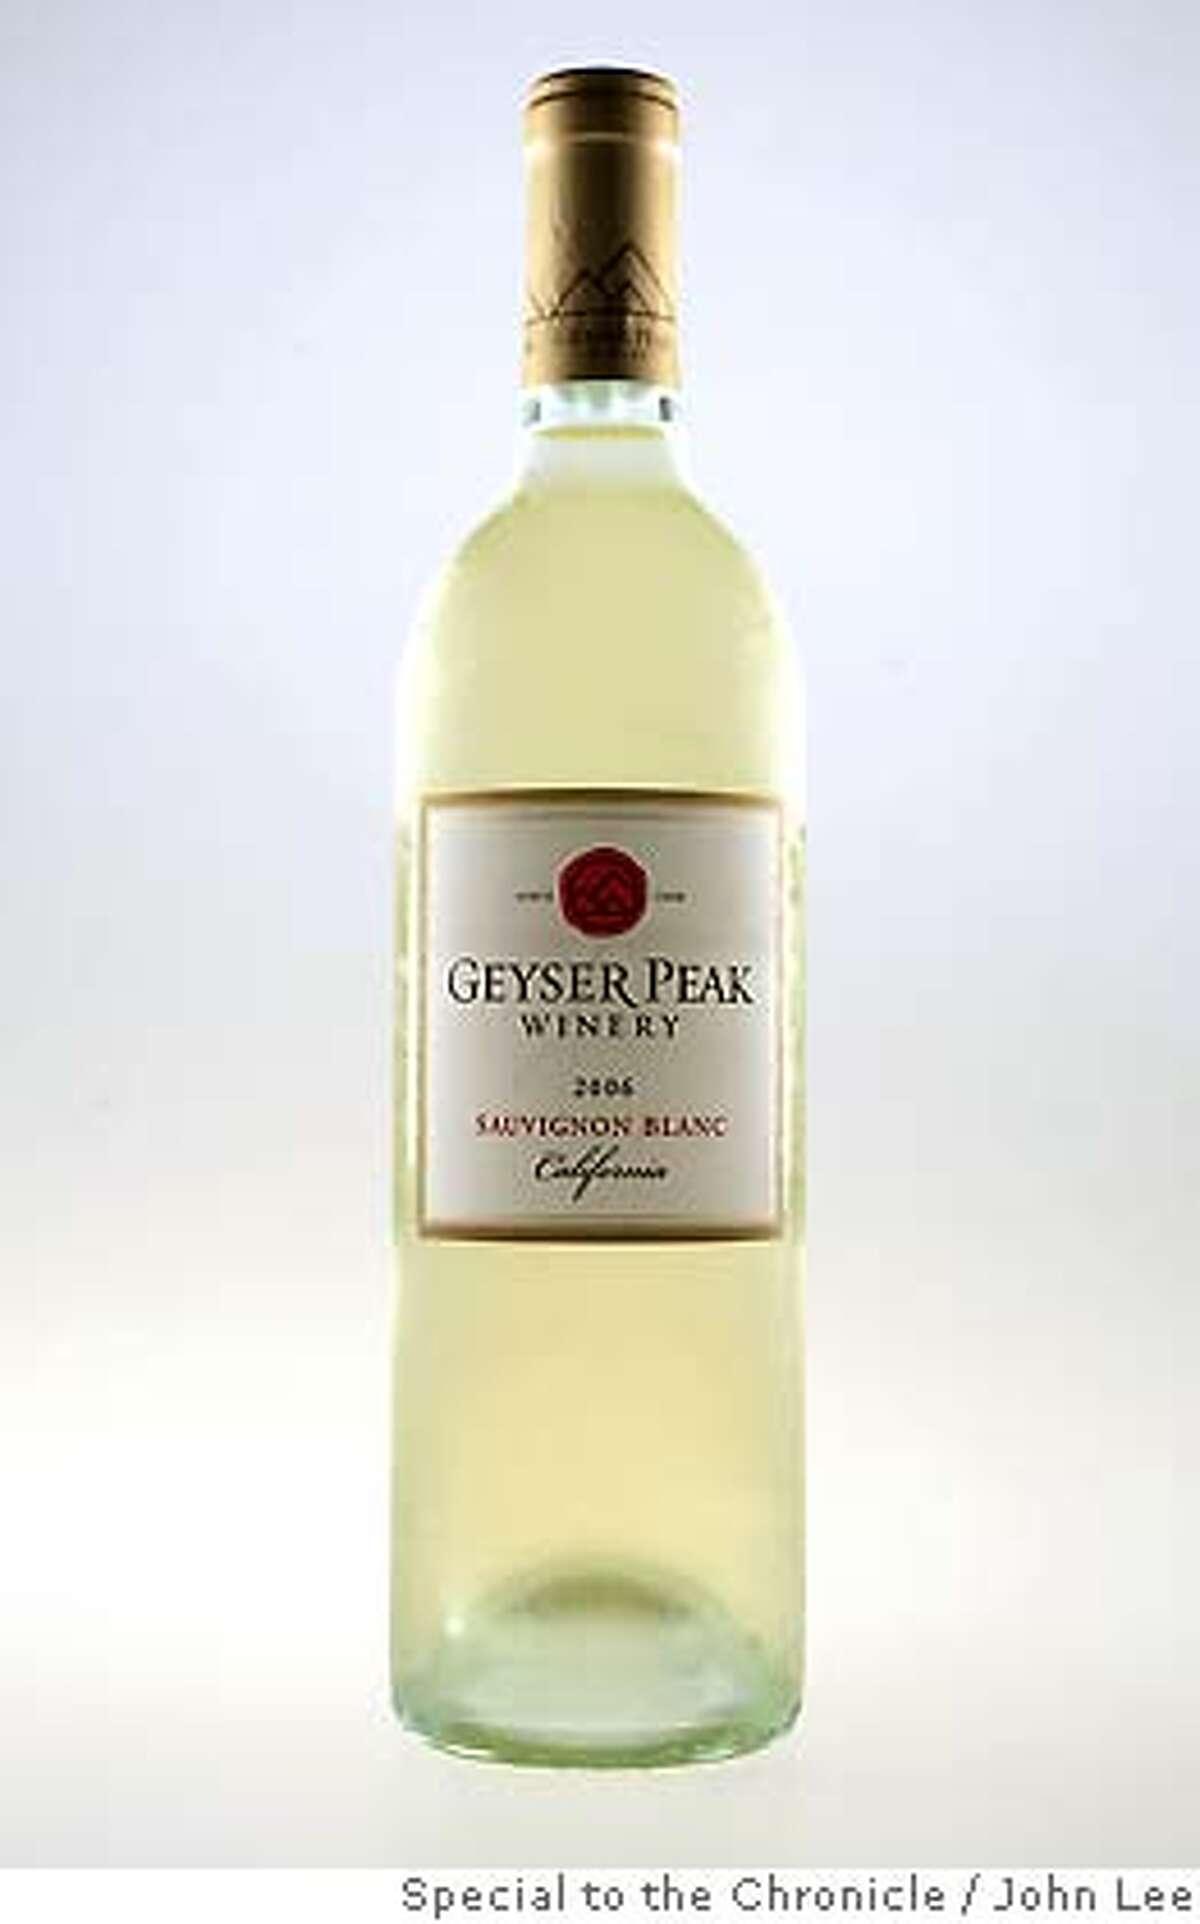 OYSTERGUIDE28_07_JOHNLEE.JPG Geyser peak 2006 Sauvignon Blanc. By JOHN LEE/